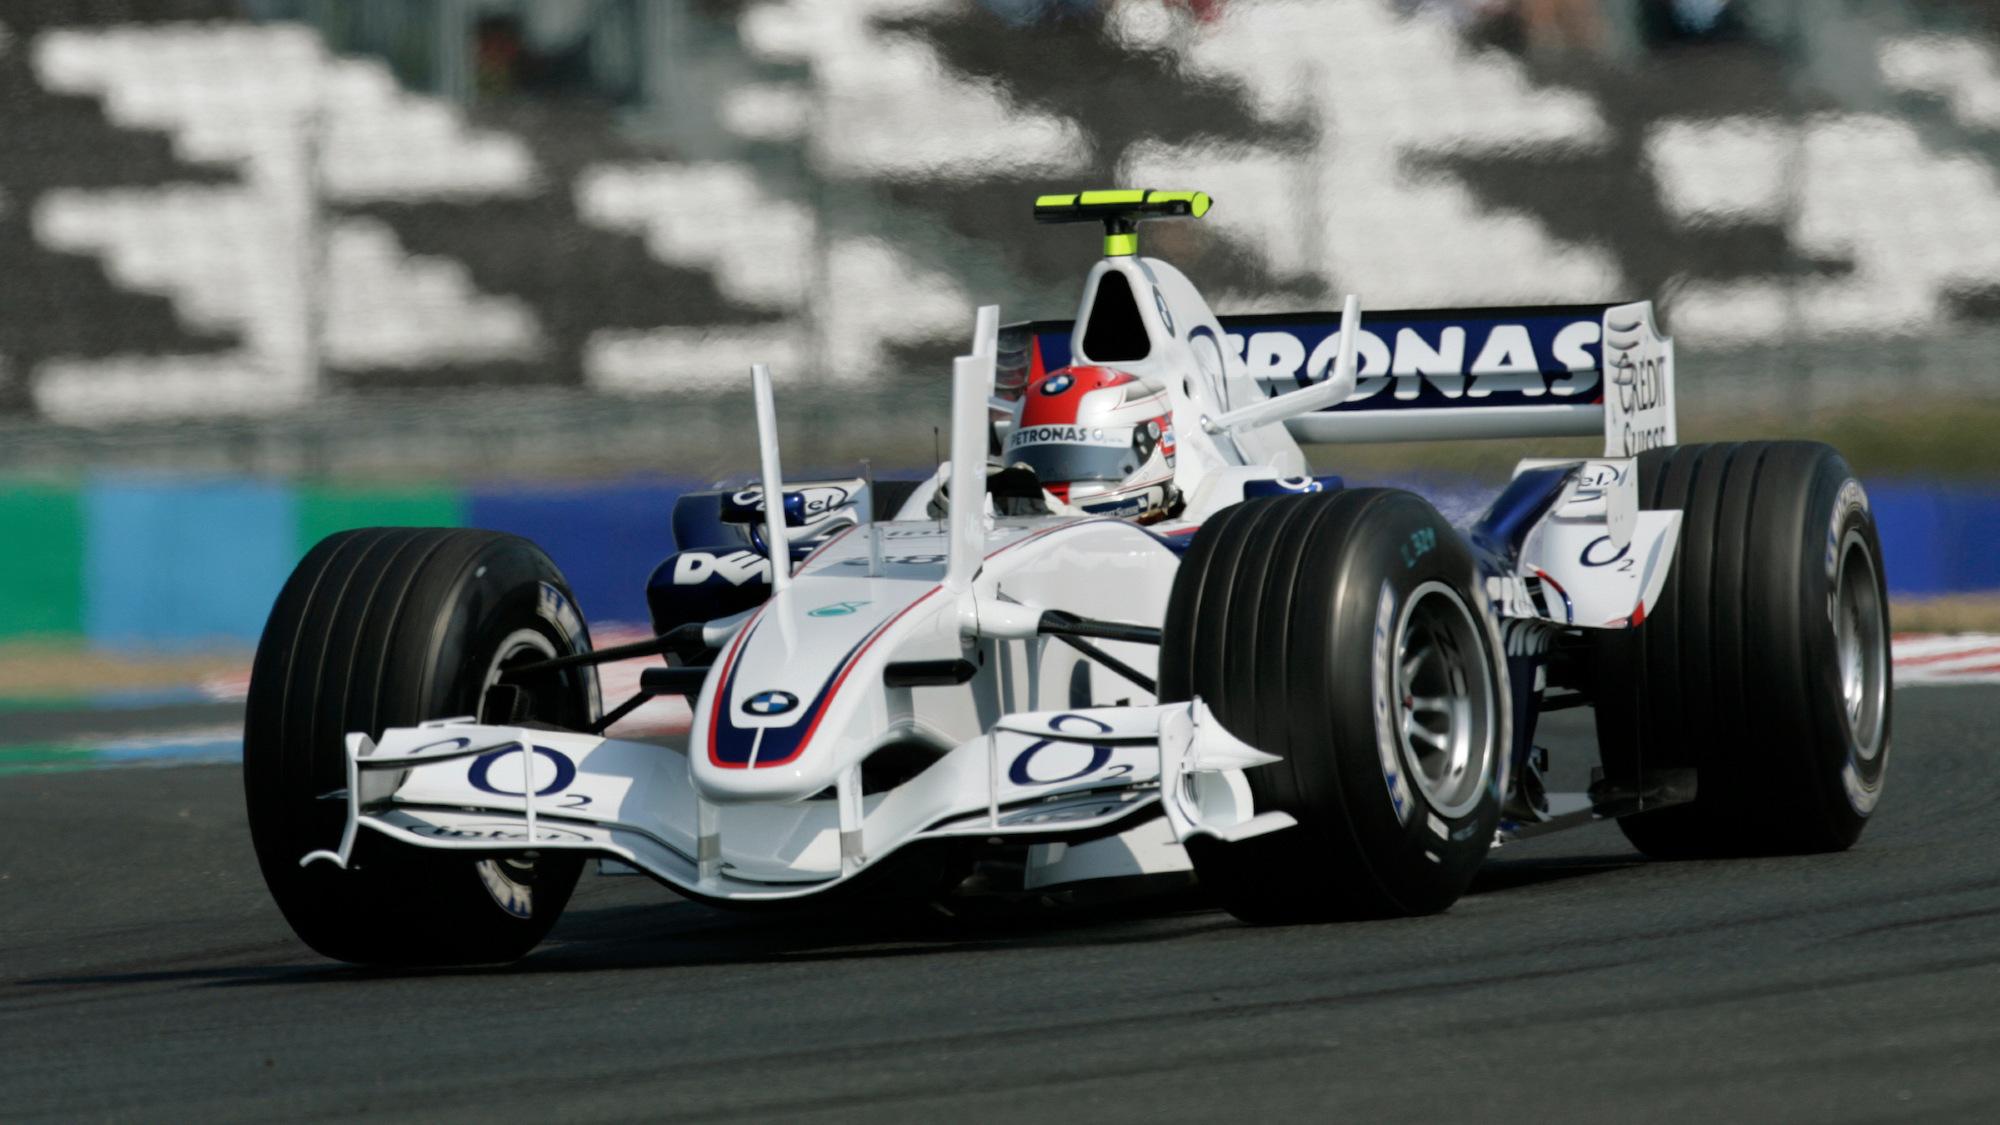 BMW Sauber 2006 French GP RObert kubica